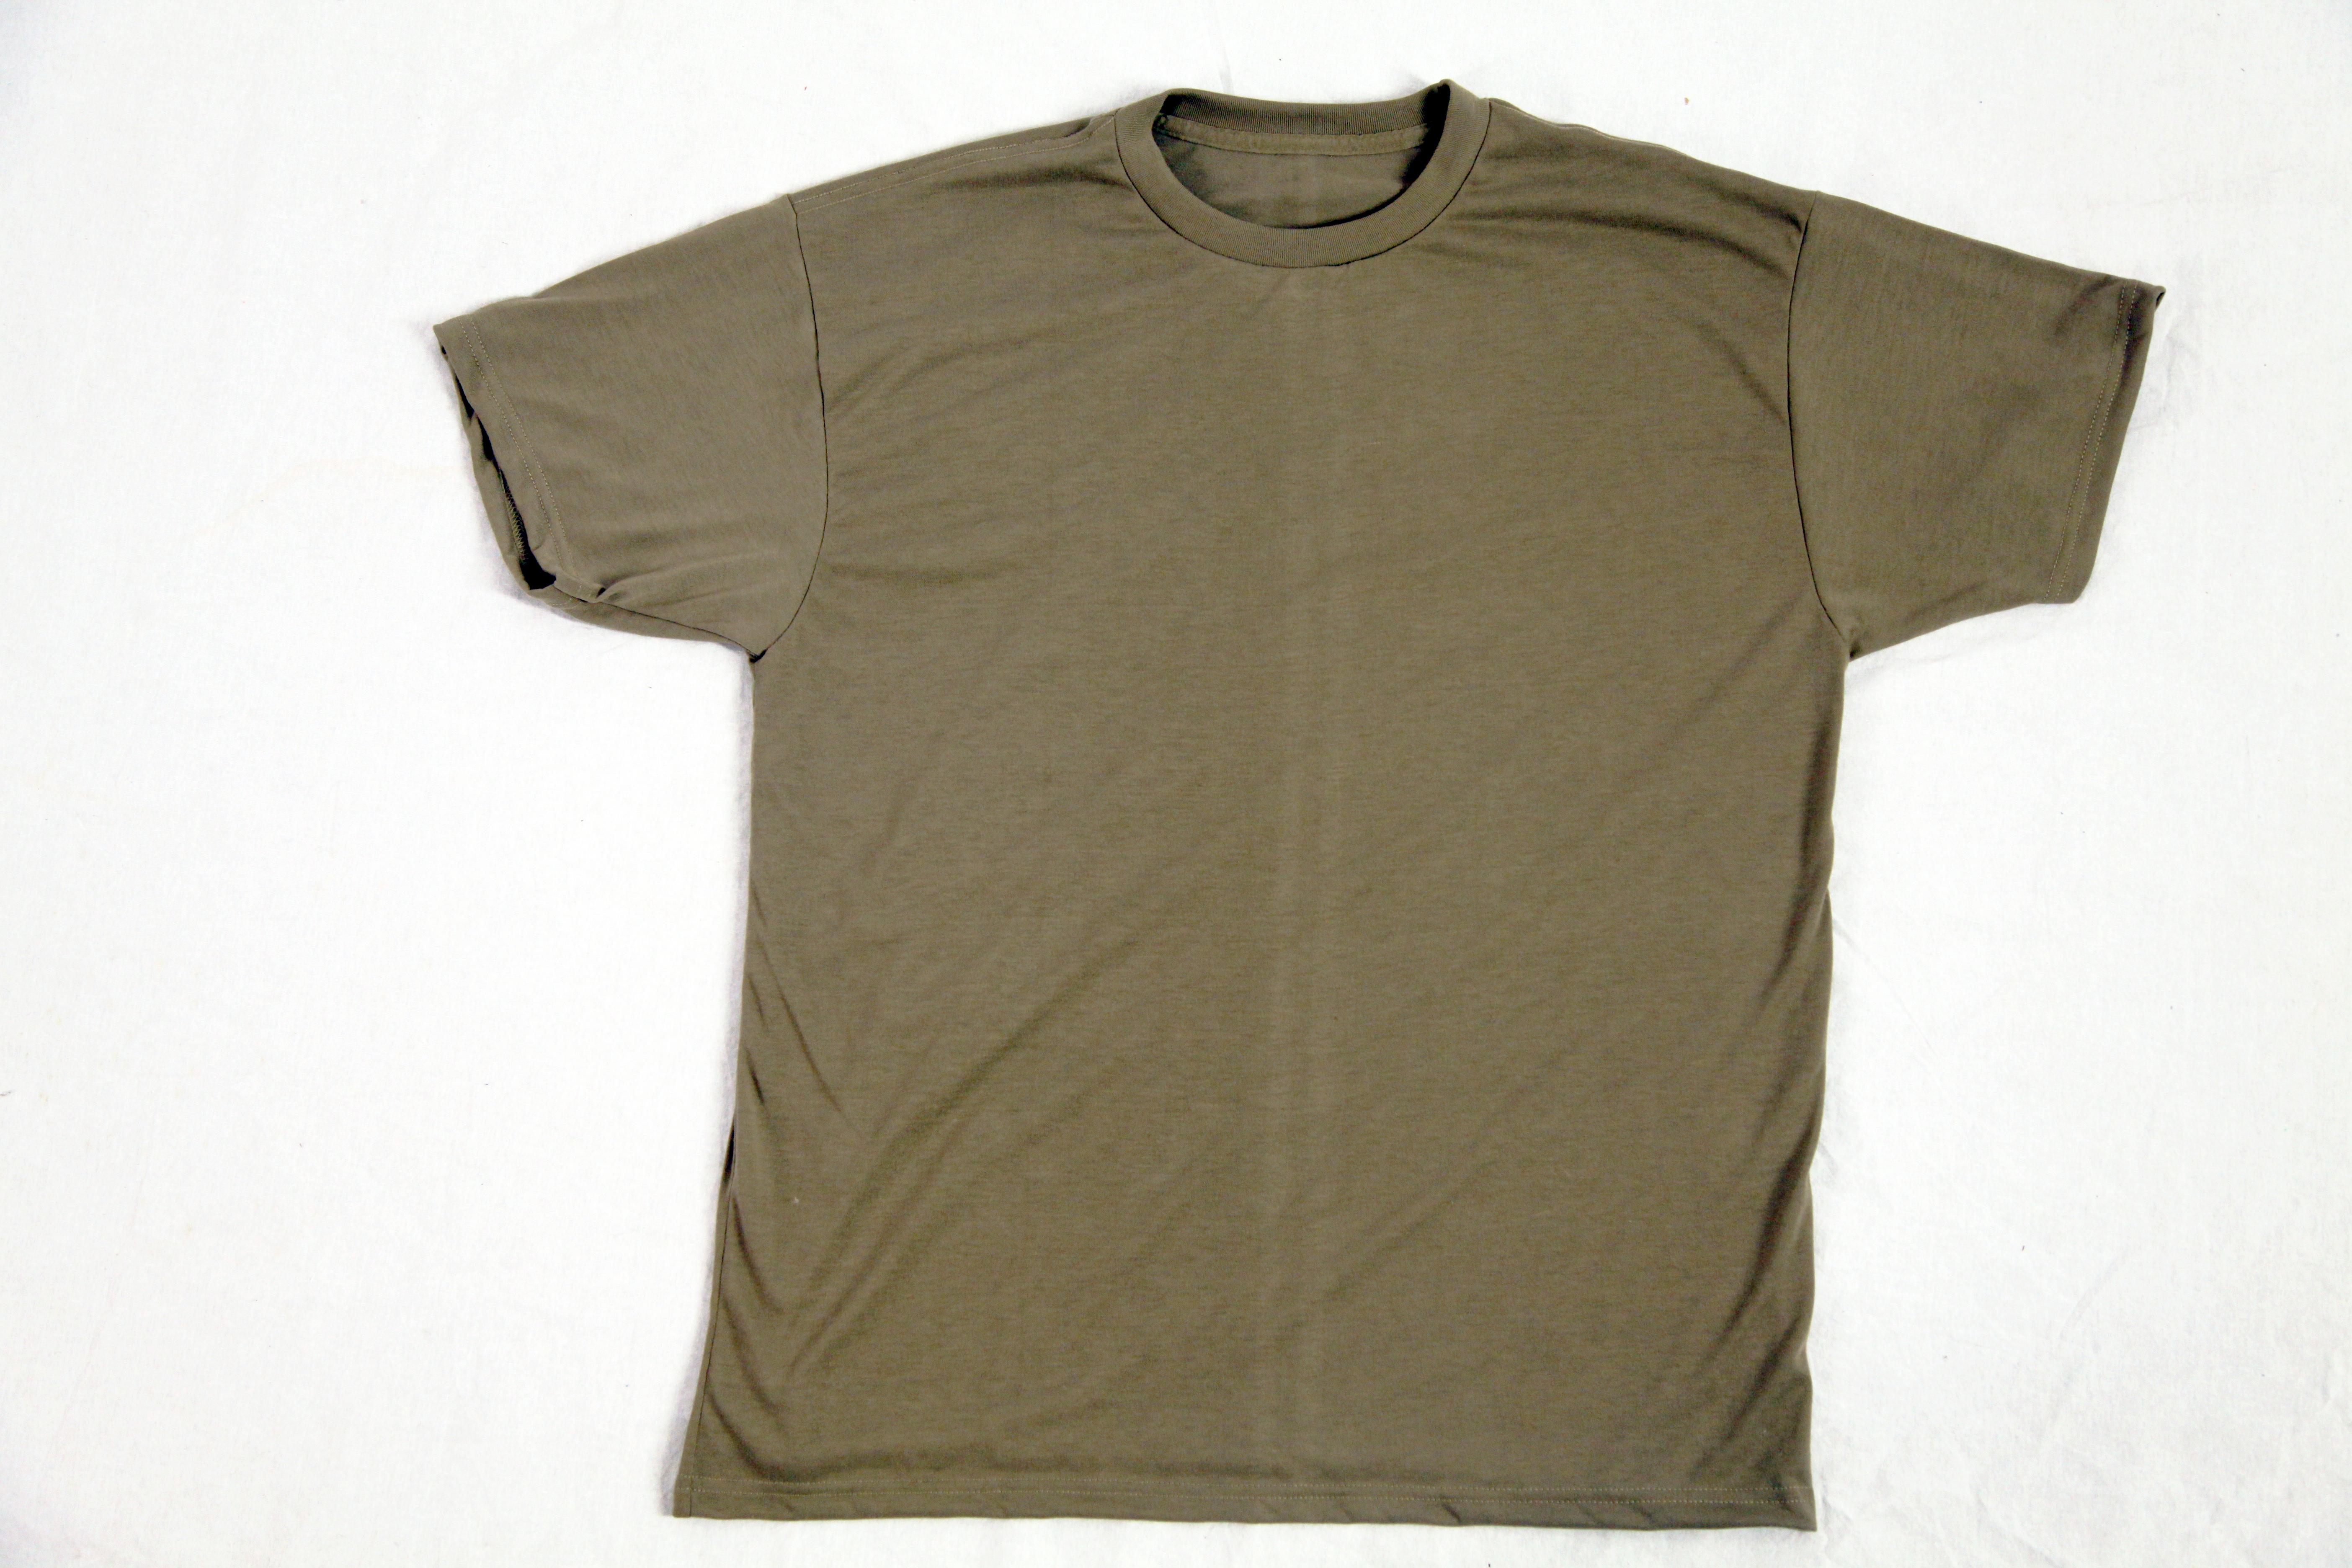 New Camo Army Combat Uniform Boots Belt Tshirt Acu